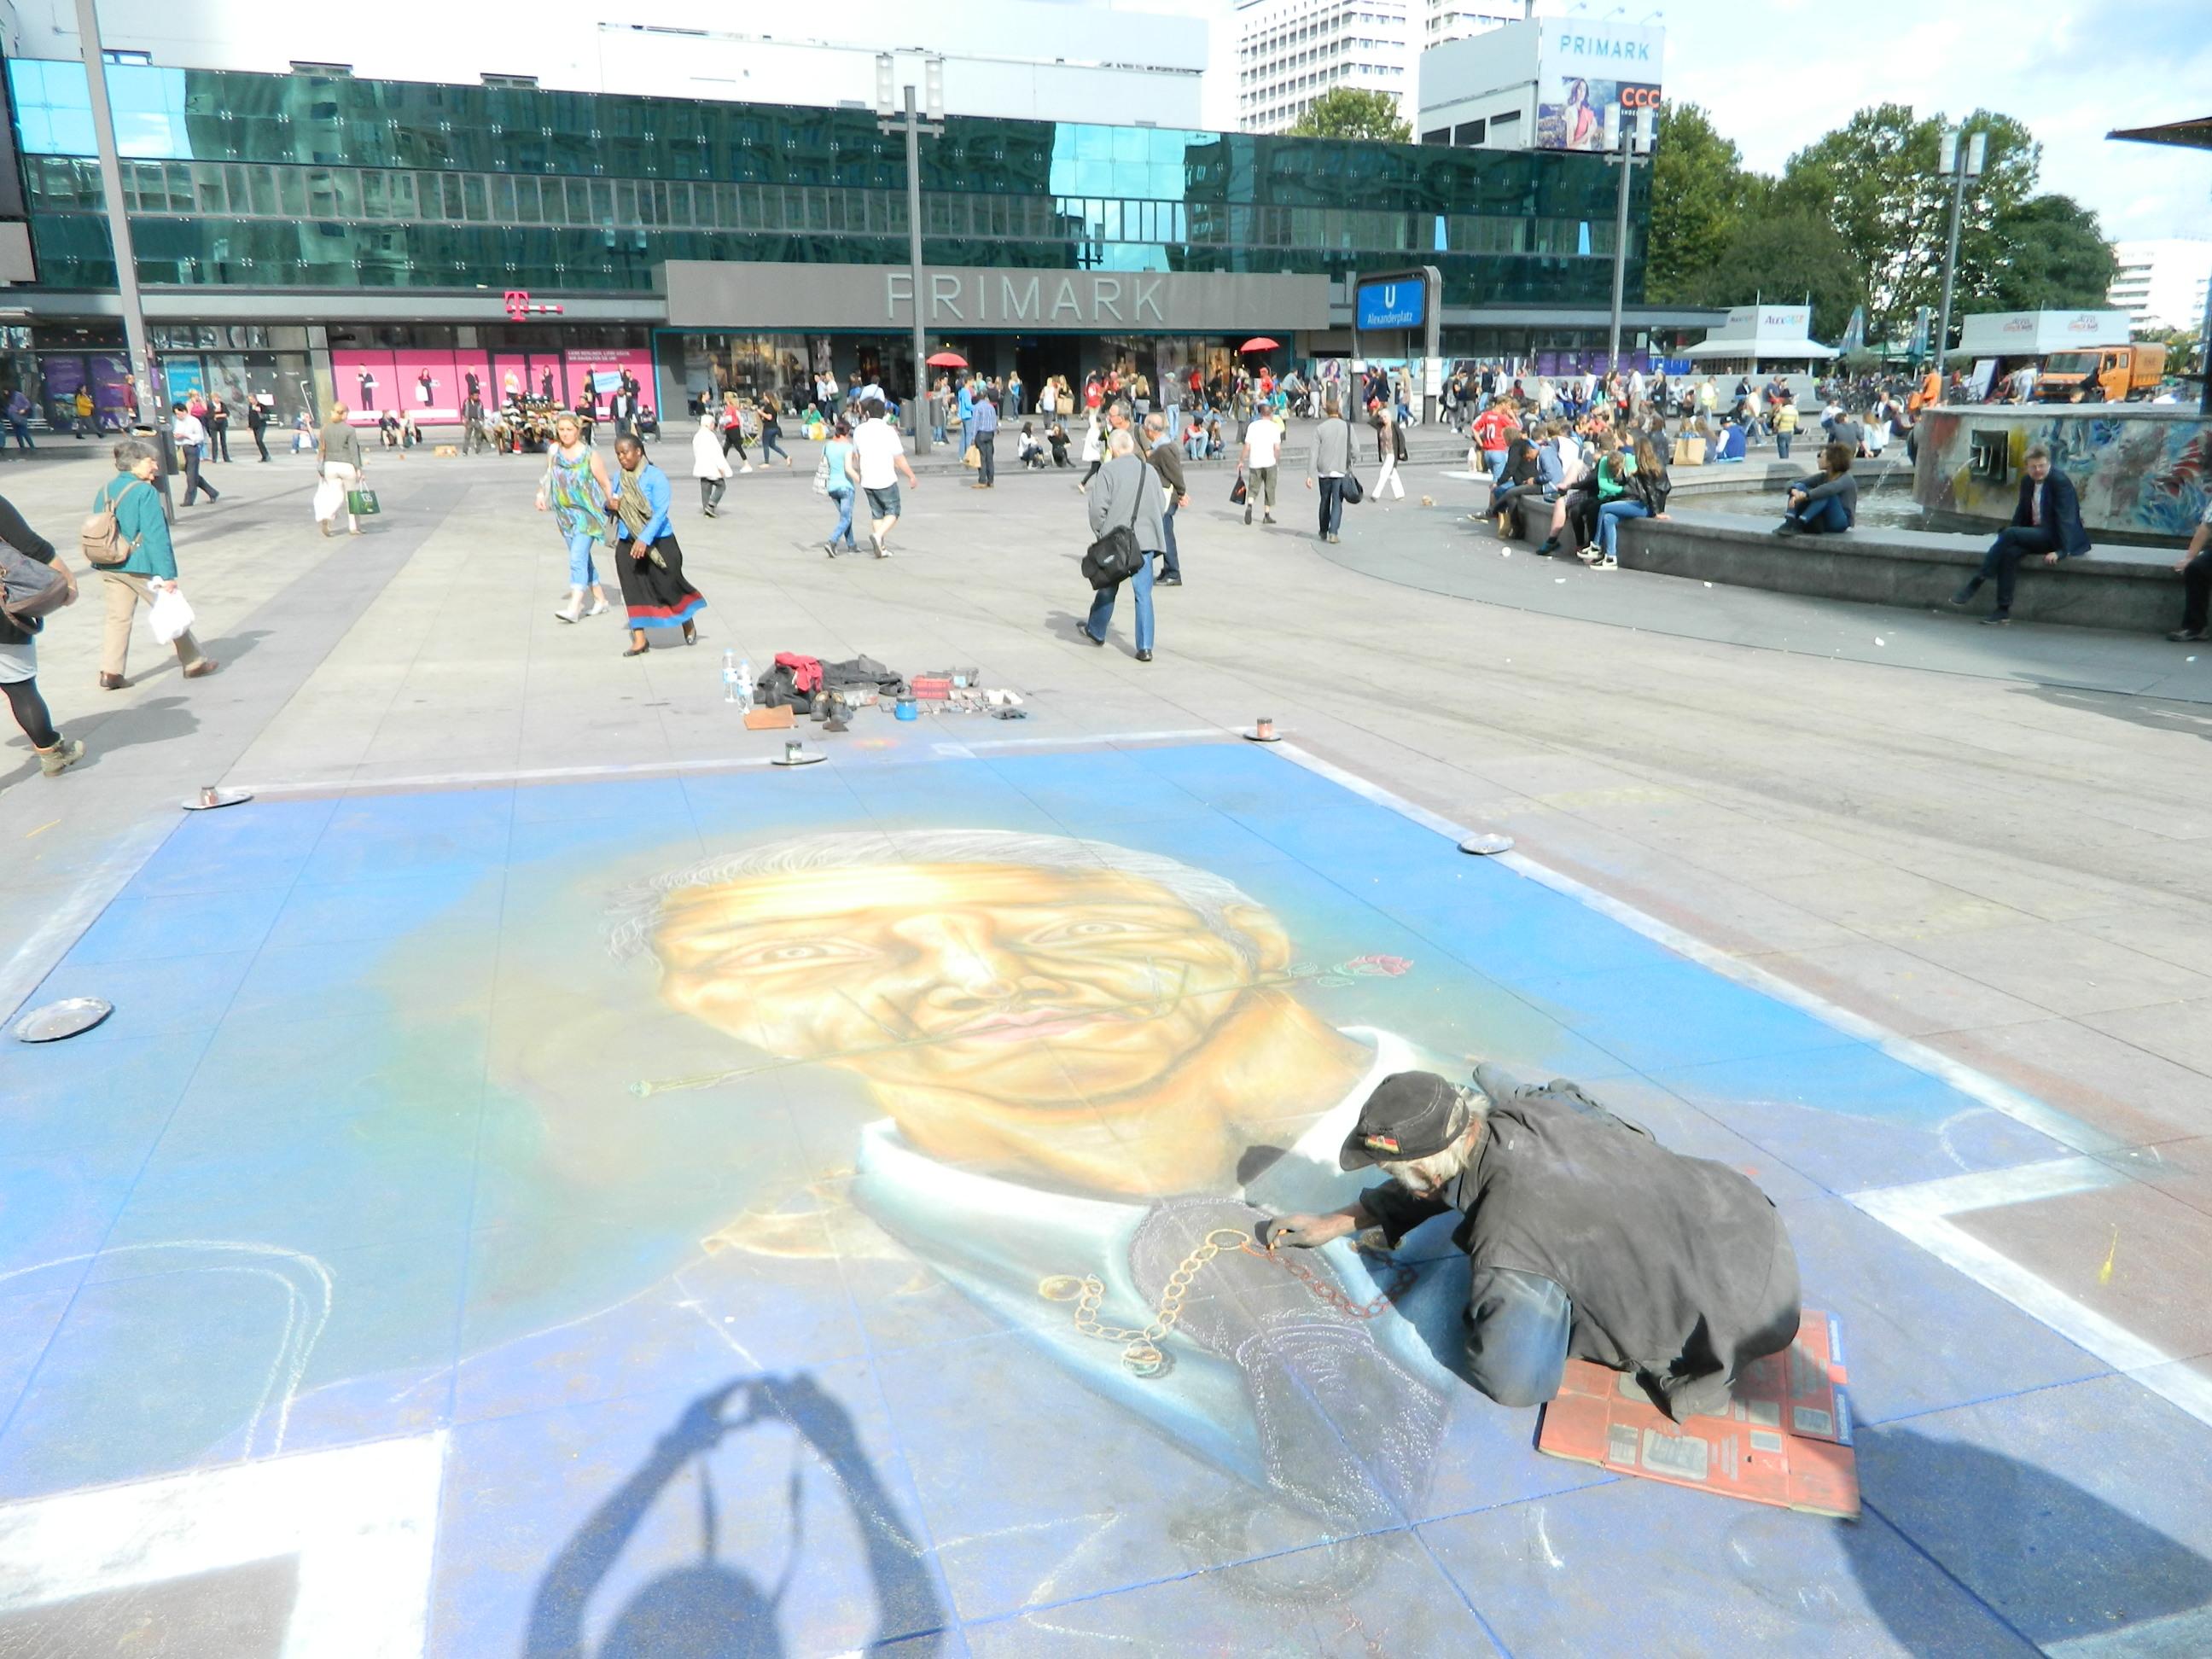 10 Artist pietonal pe asfaltul din Alexanderplatz in Berlin